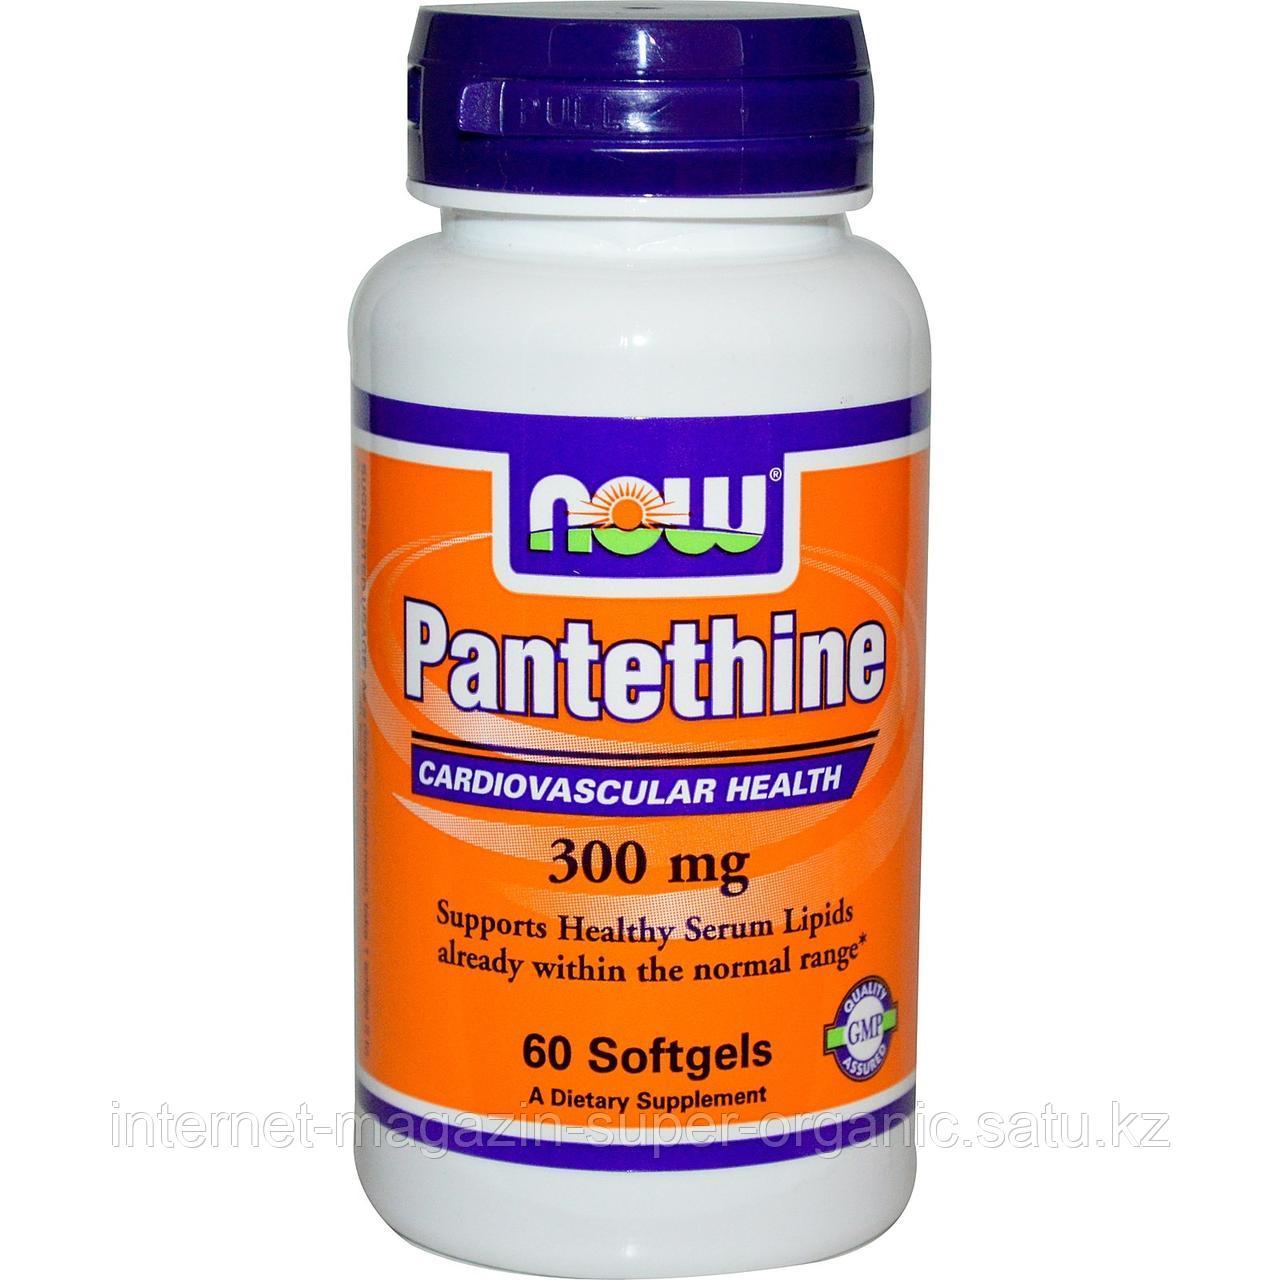 Пантетин, 300 мг, 60 капсул, (Pantethine), Now Foods